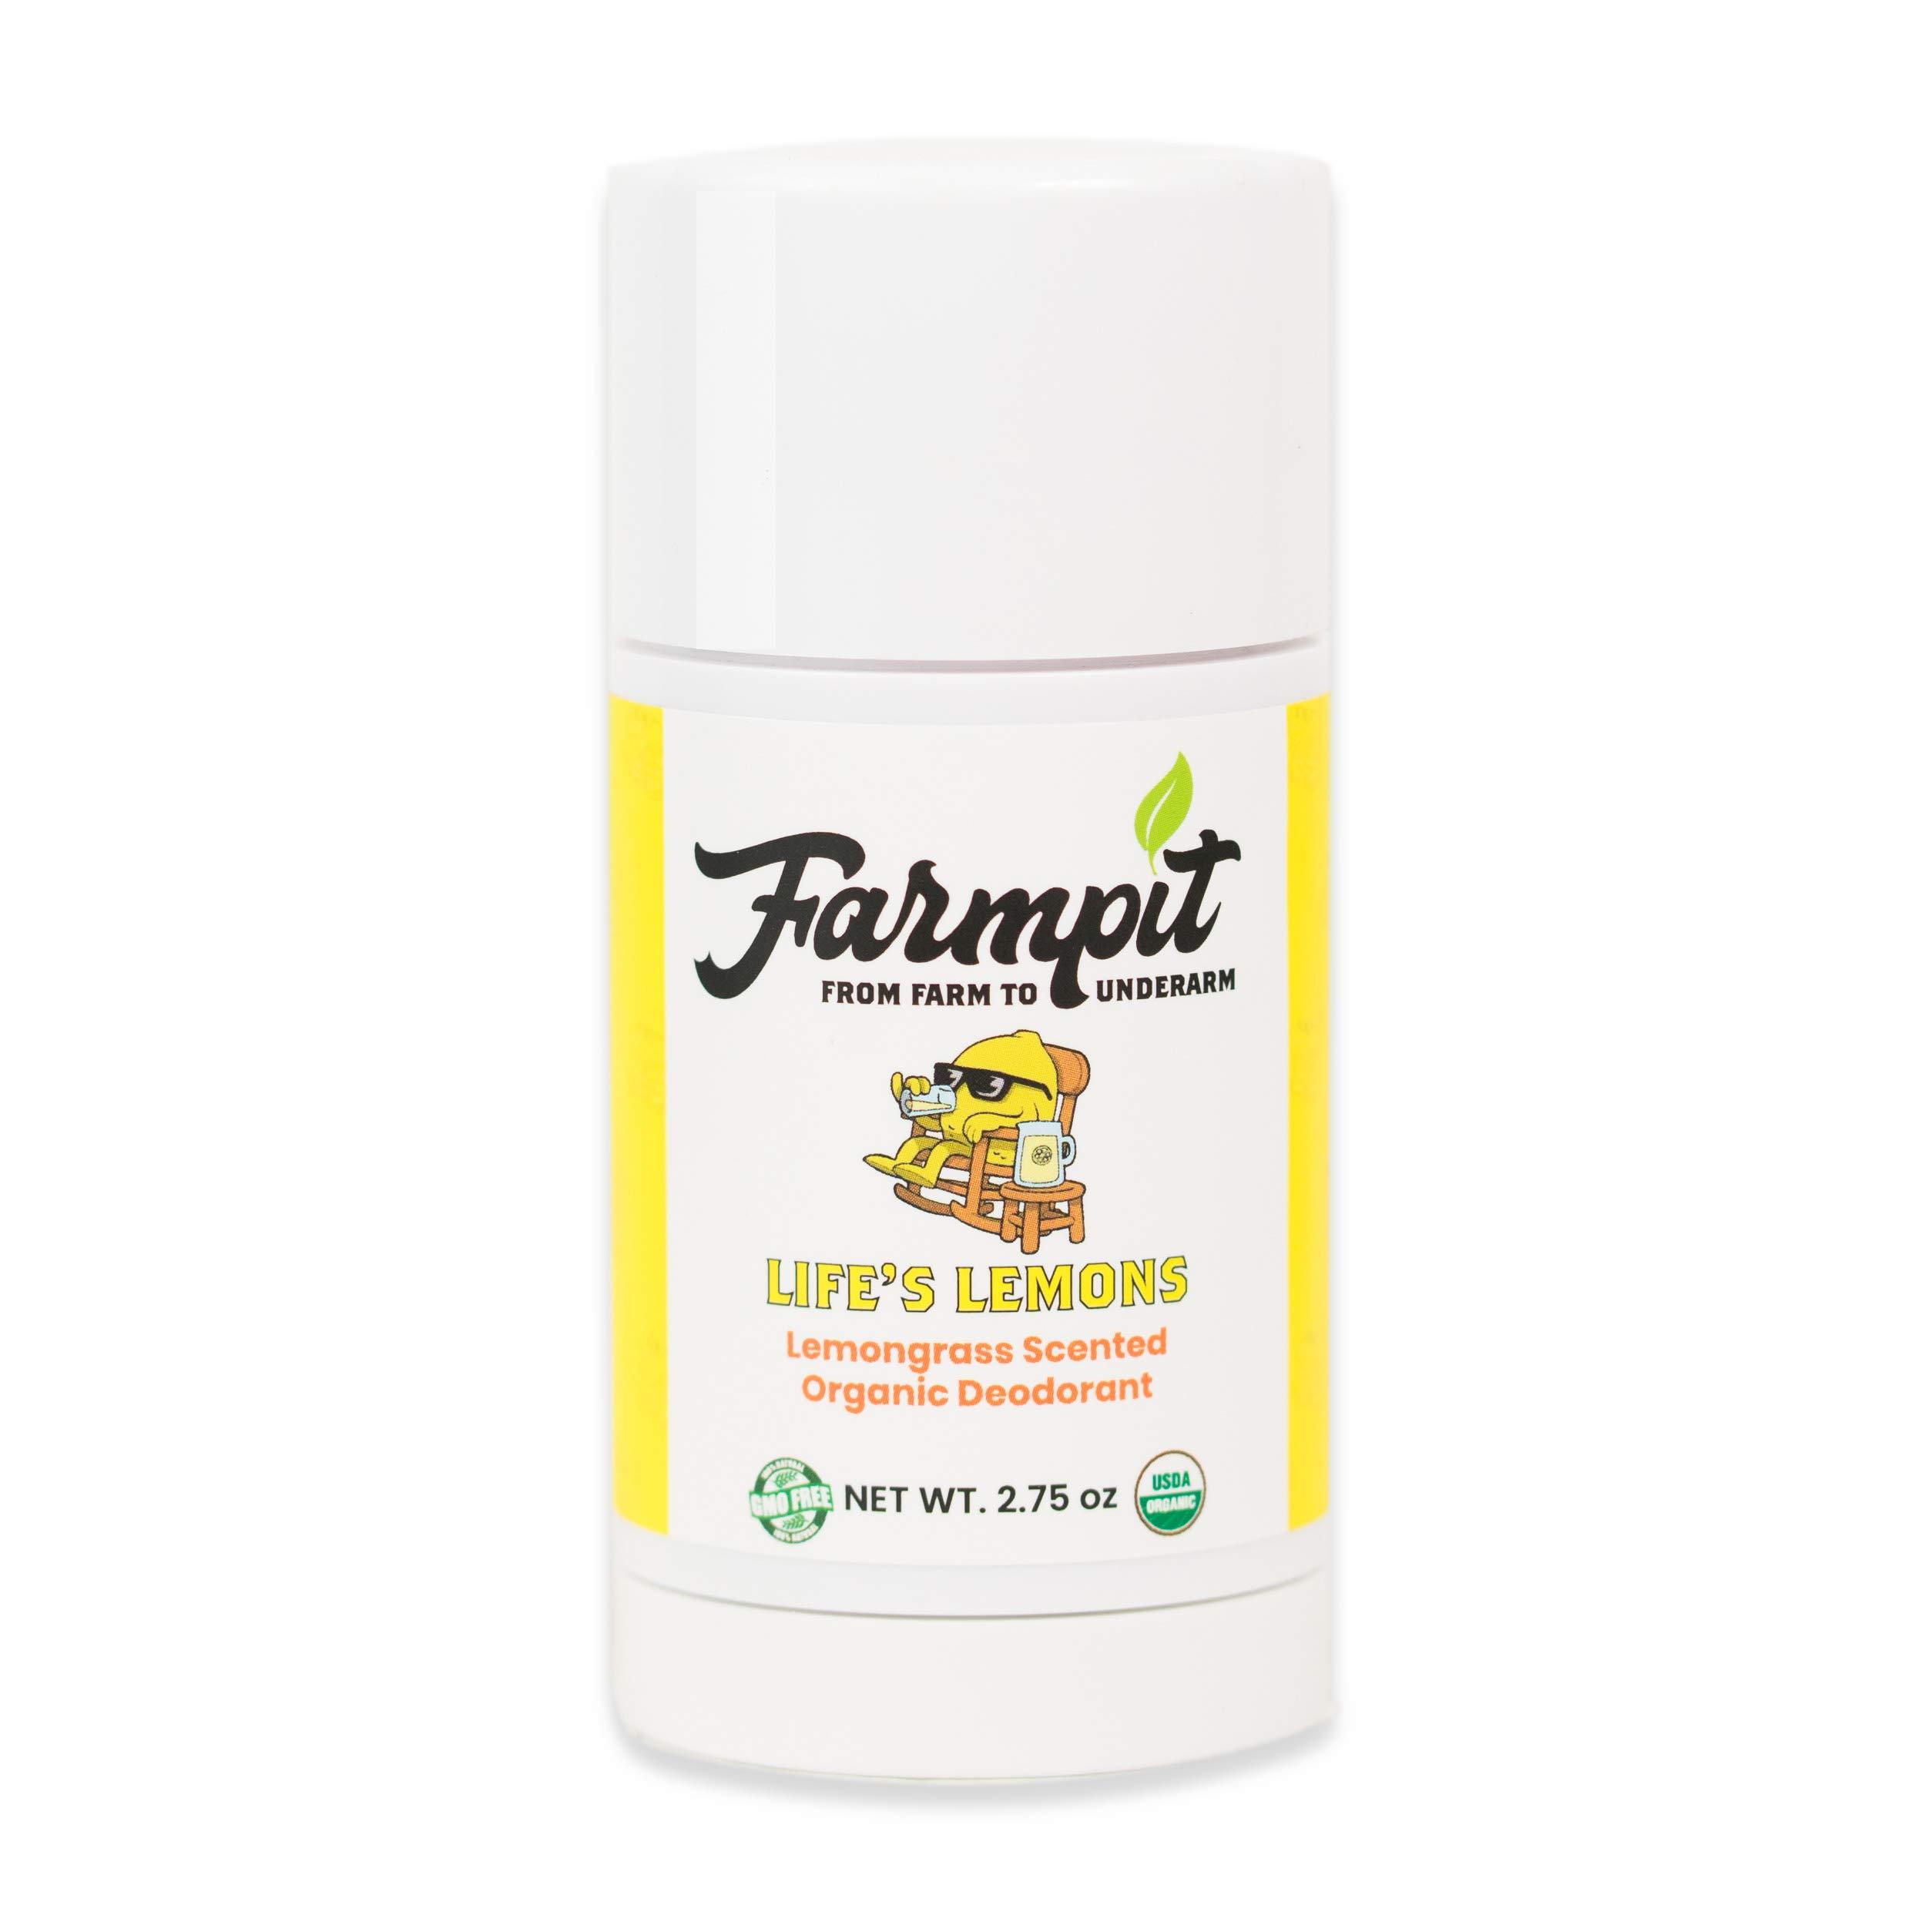 Farmpit All Natural Deodorant - USDA Certified Organic - Aluminum, Paraben, Propylene, Gluten, Cruelty and Baking Soda Free - for Men or Women - Stay Fresh All Day (Life's Lemons)